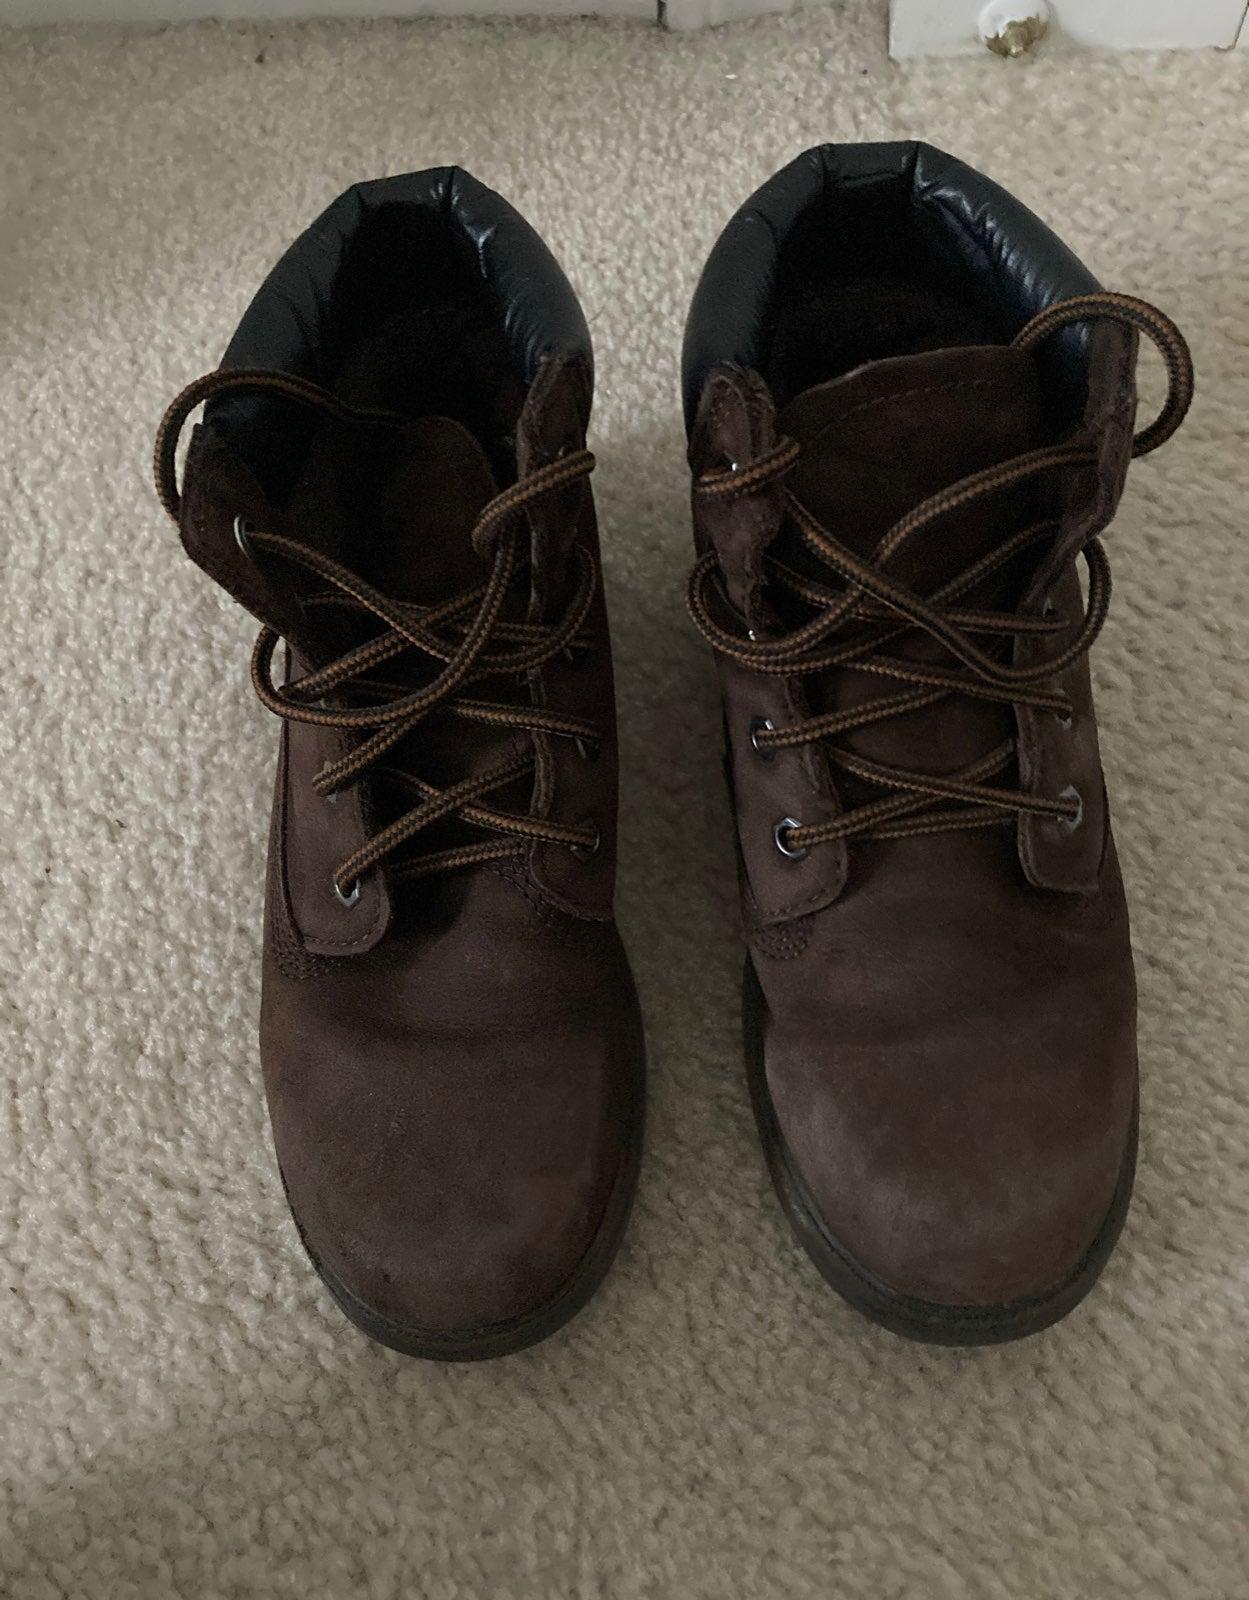 Sperry Boy's boots 12W